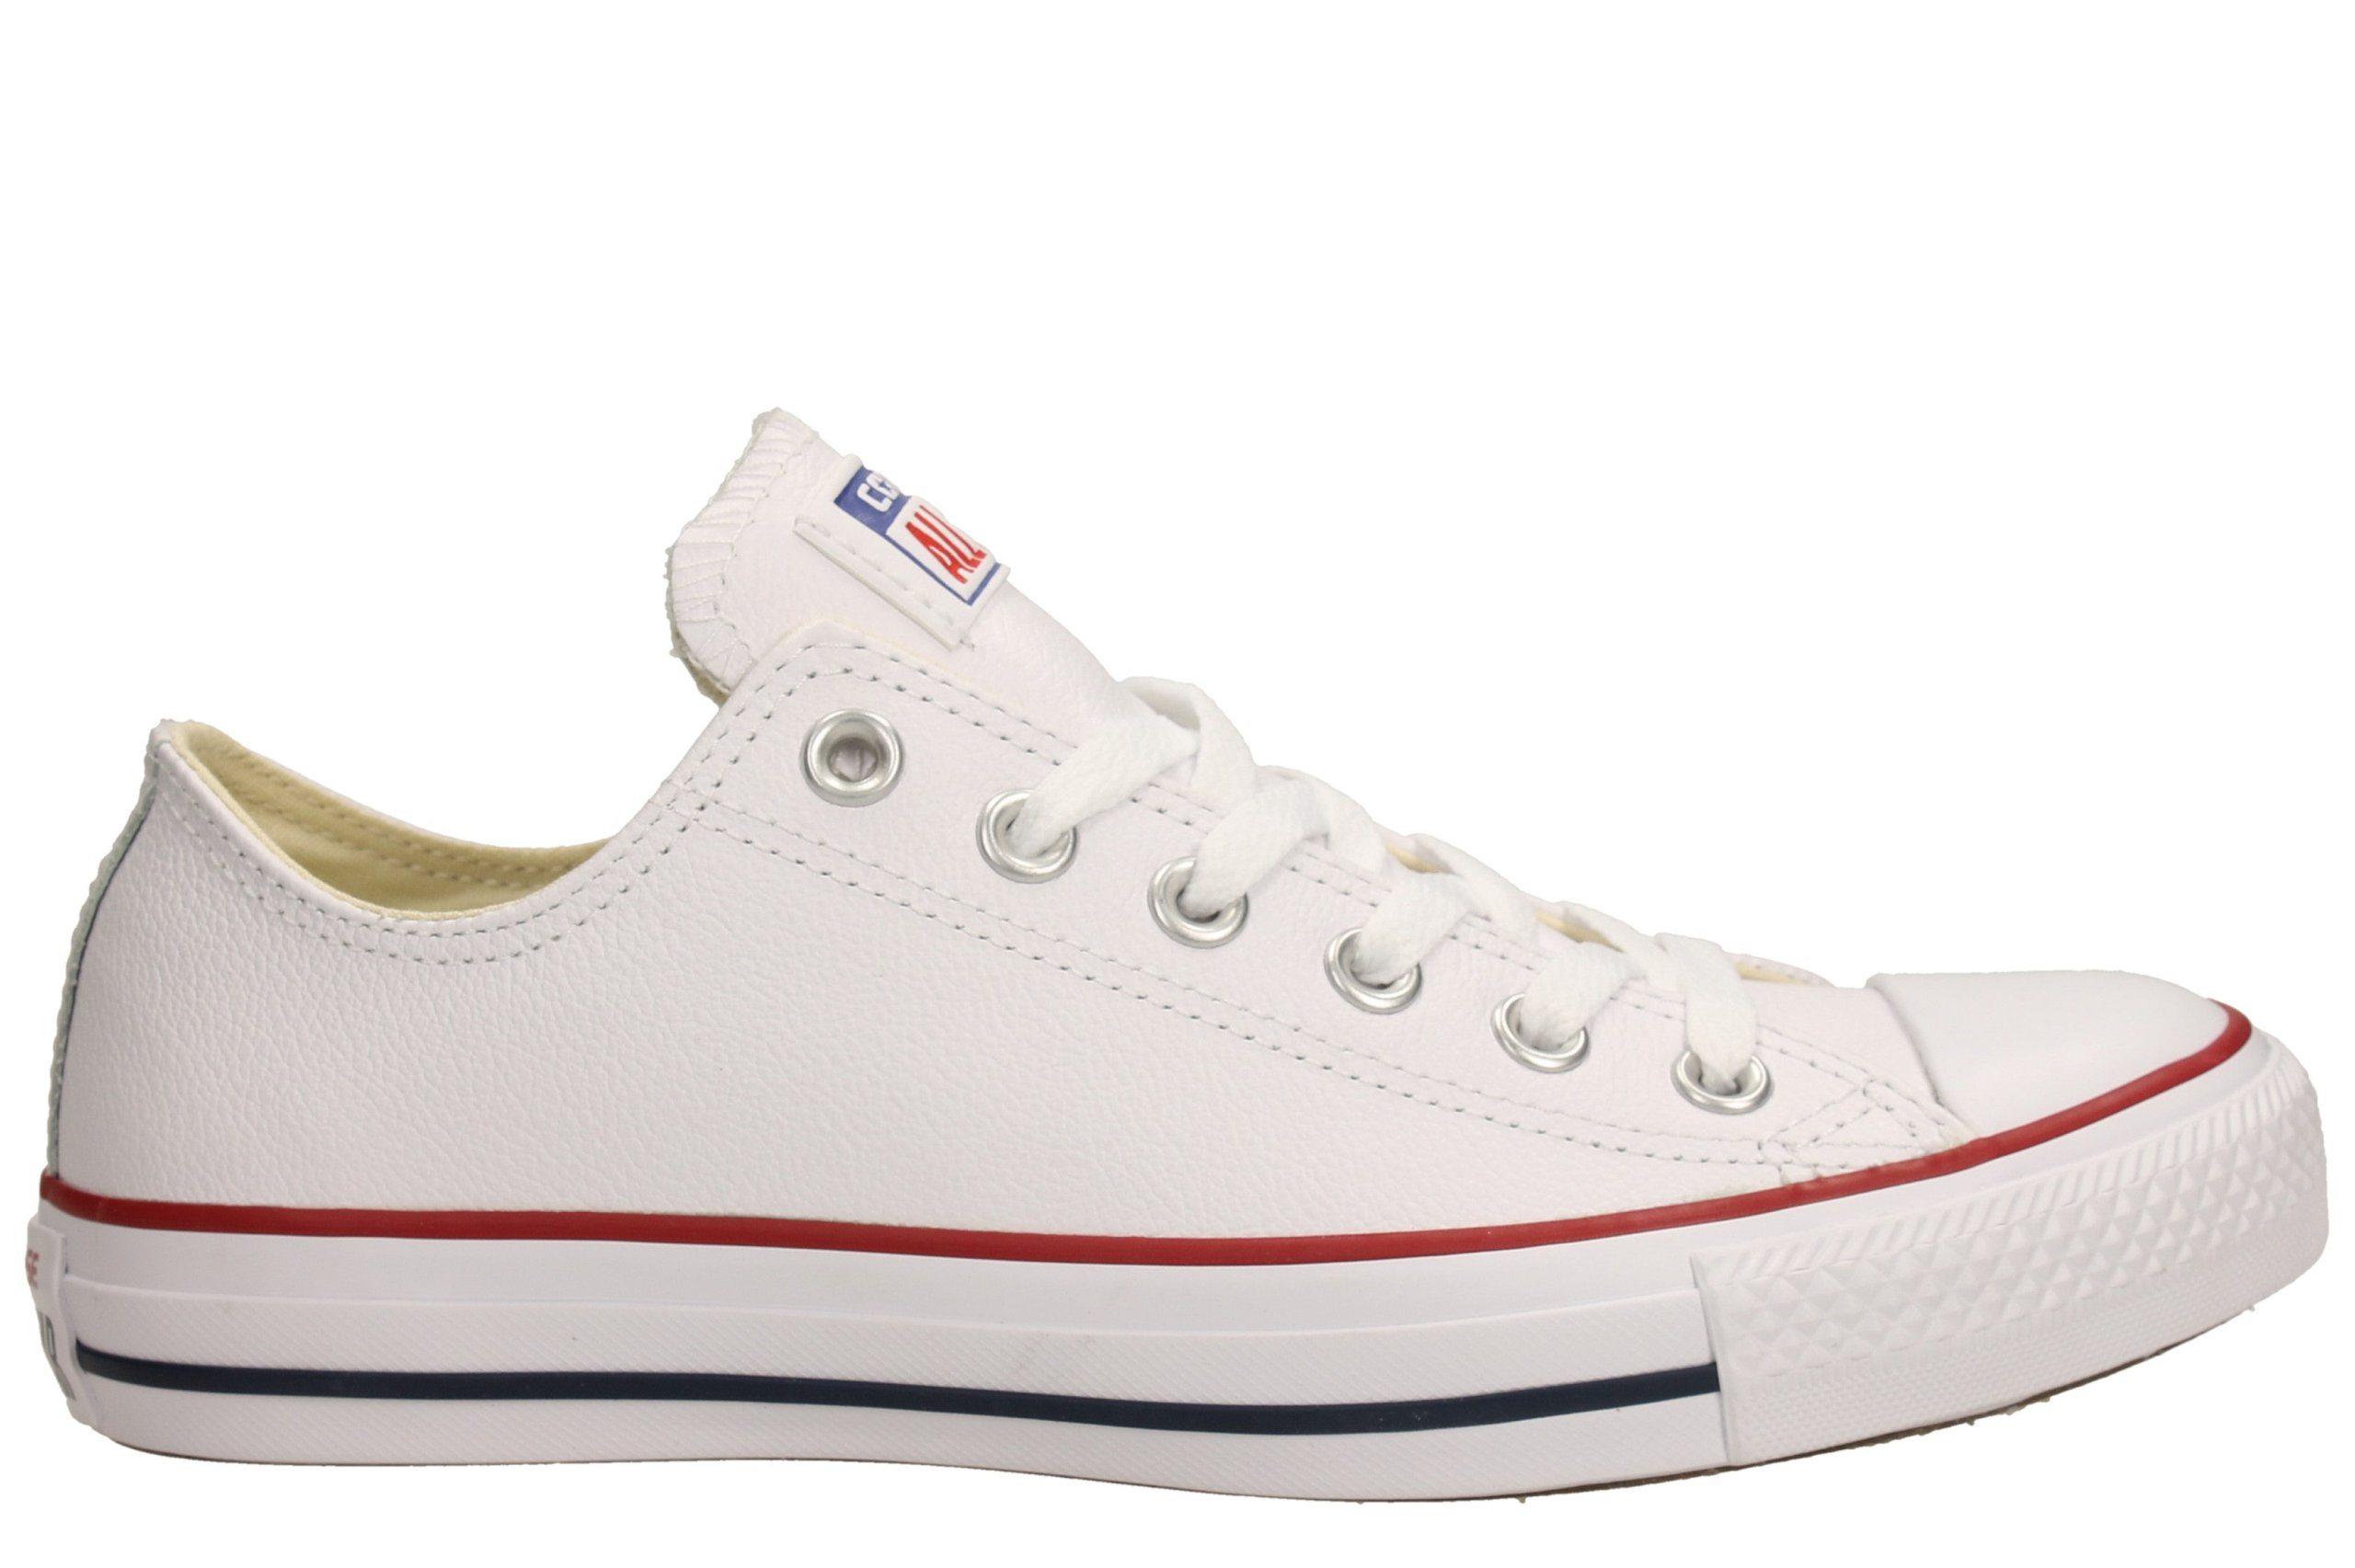 adidas Originals Superstar Boost Tenisówki Biały 46